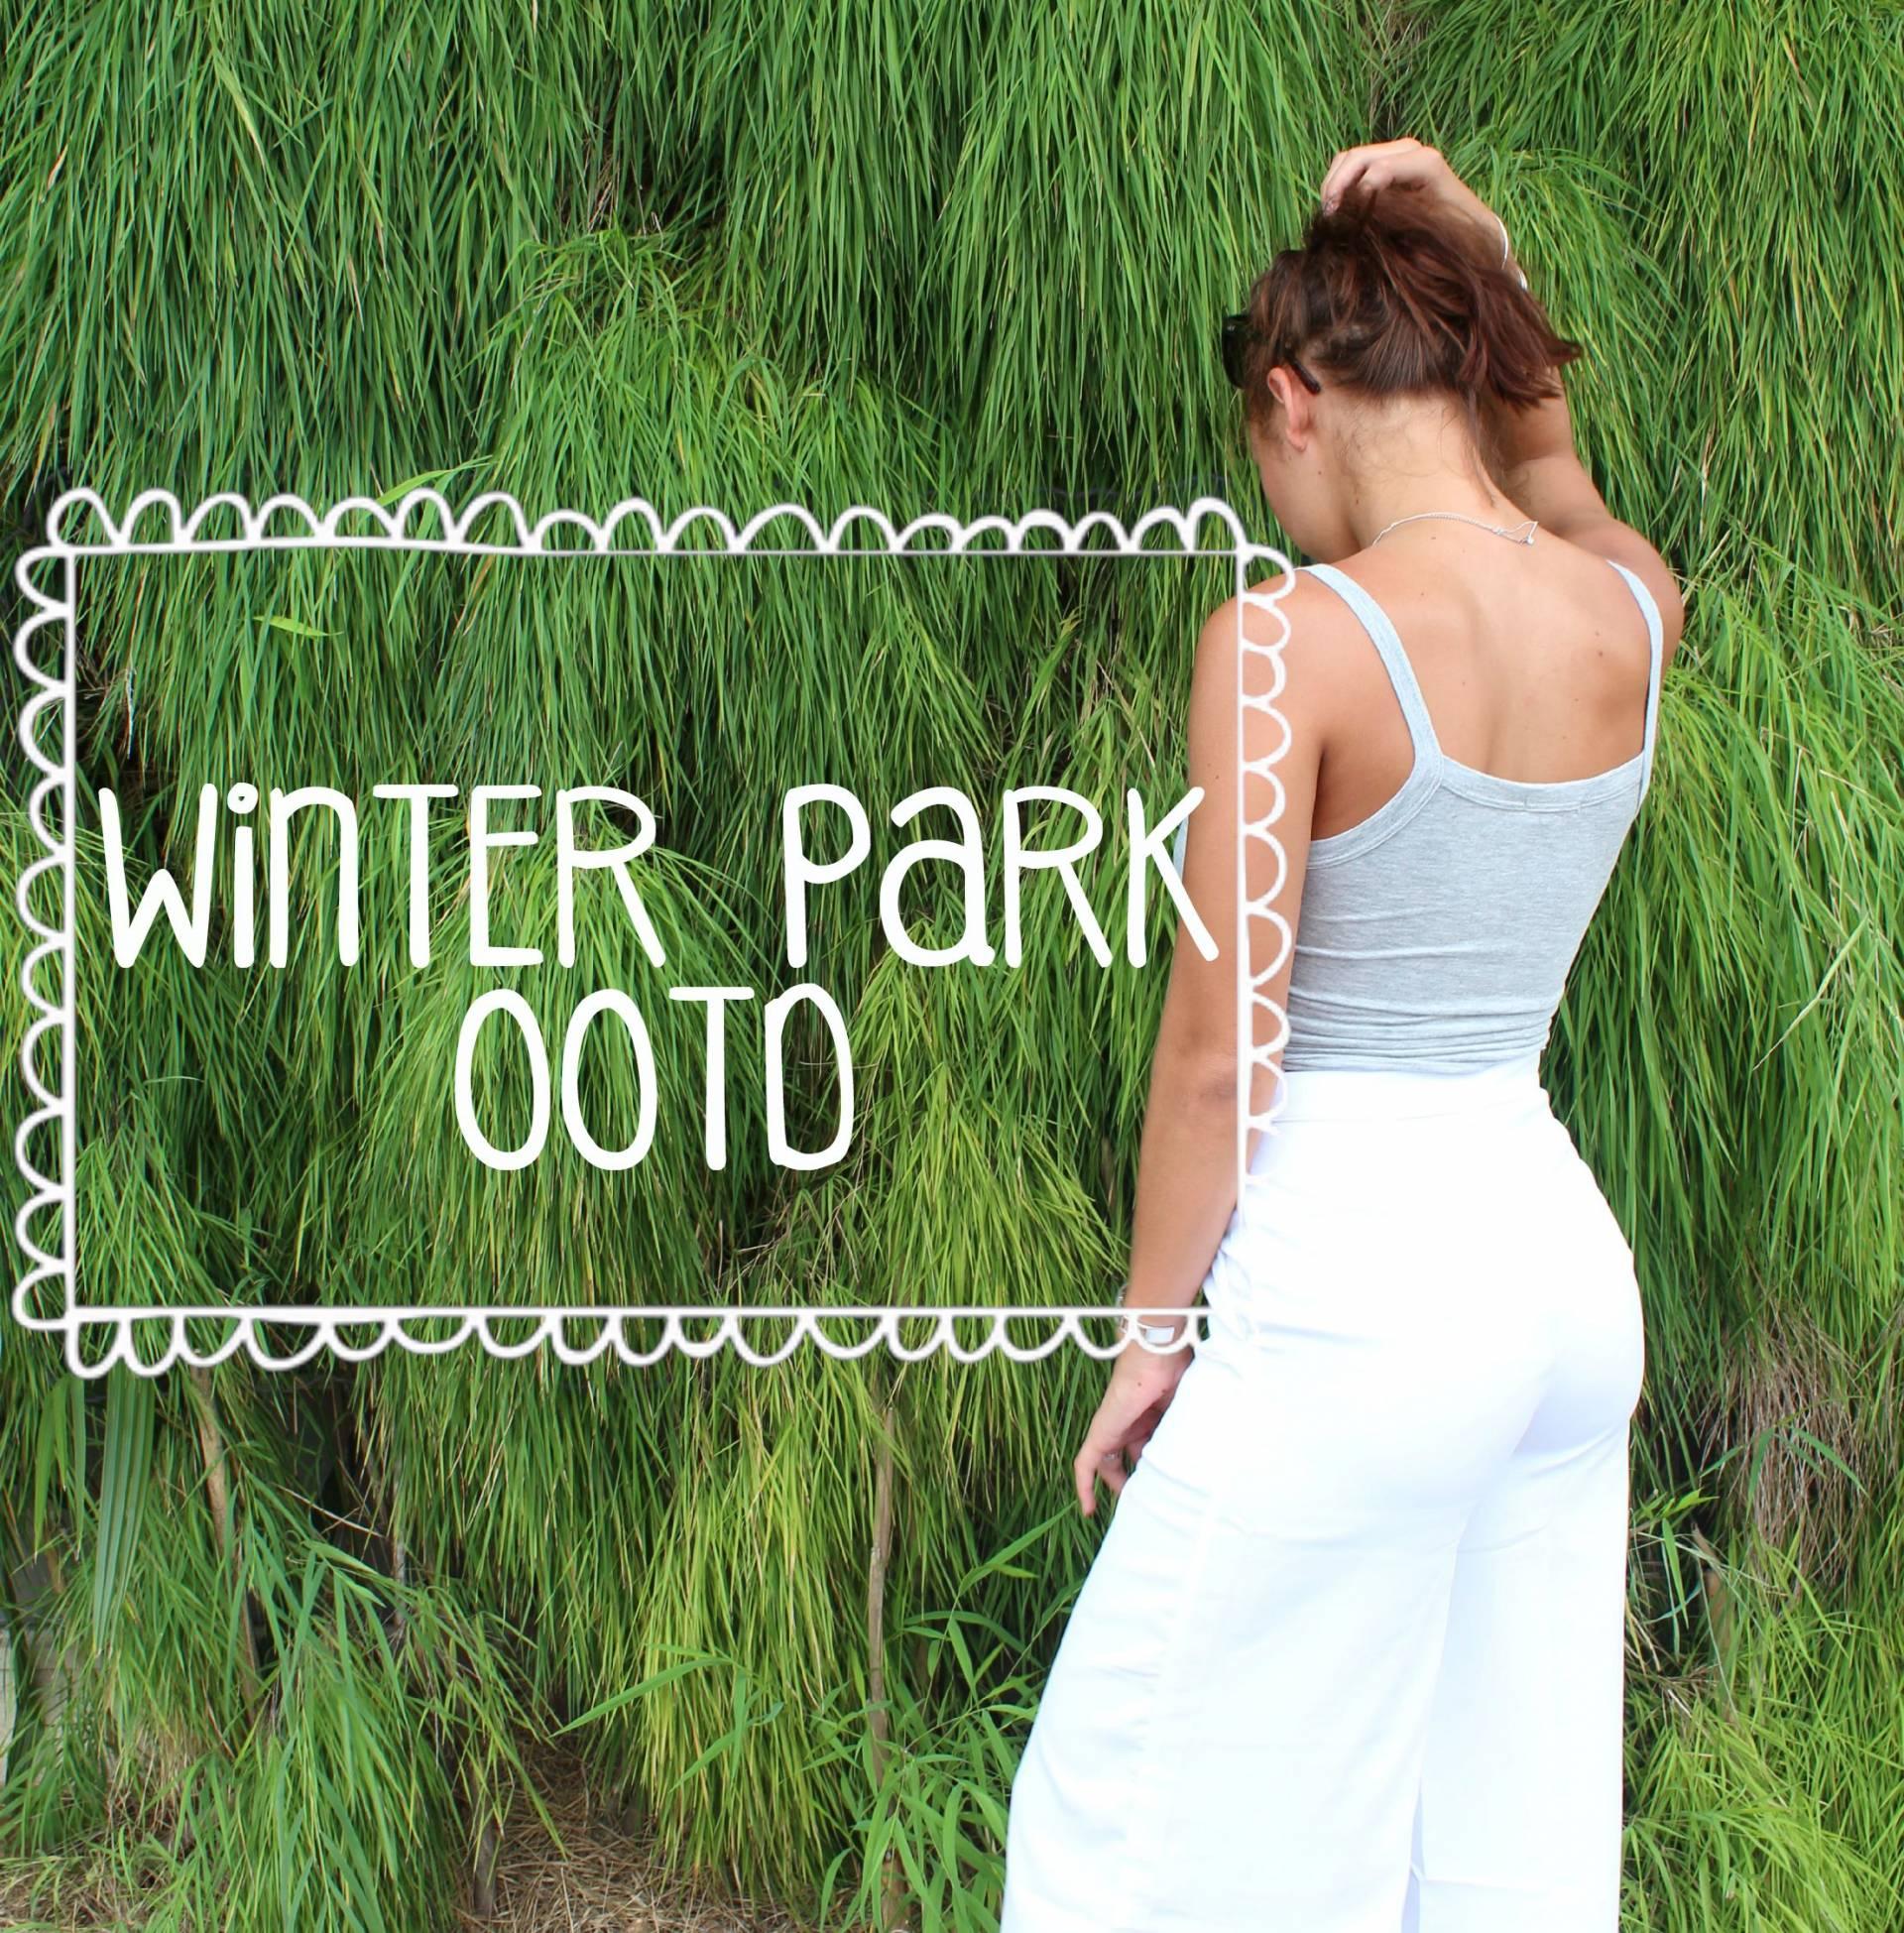 winterparkootd.jpg